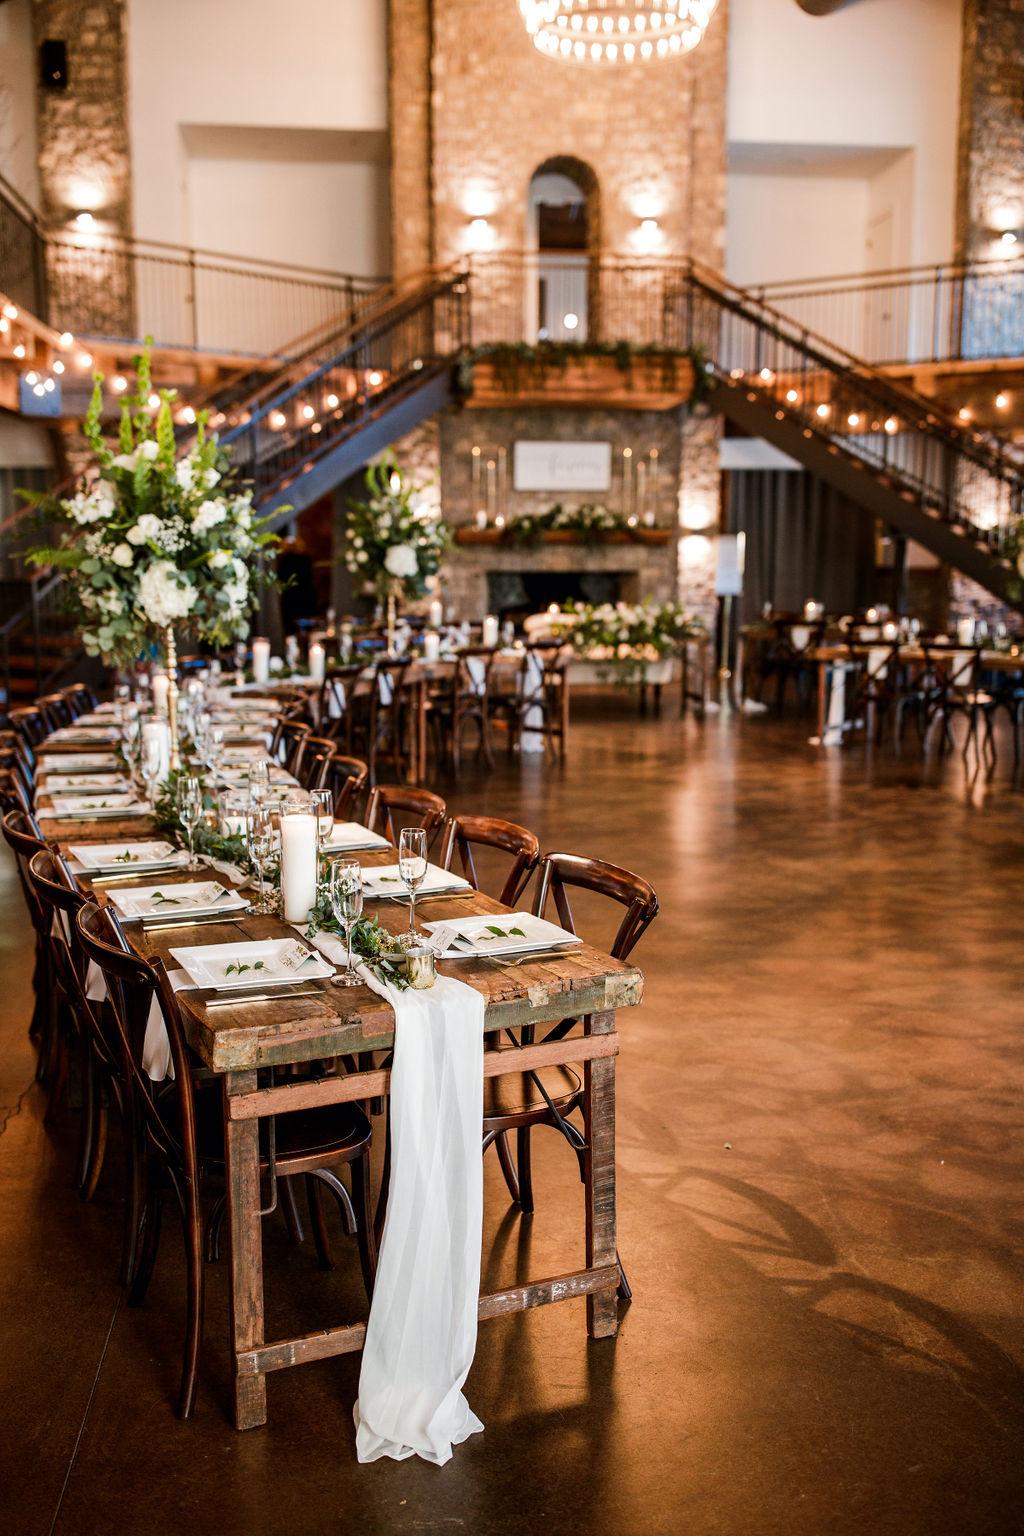 Wedding Reception Layout Inspiration featured on Nashville Bride Guide!